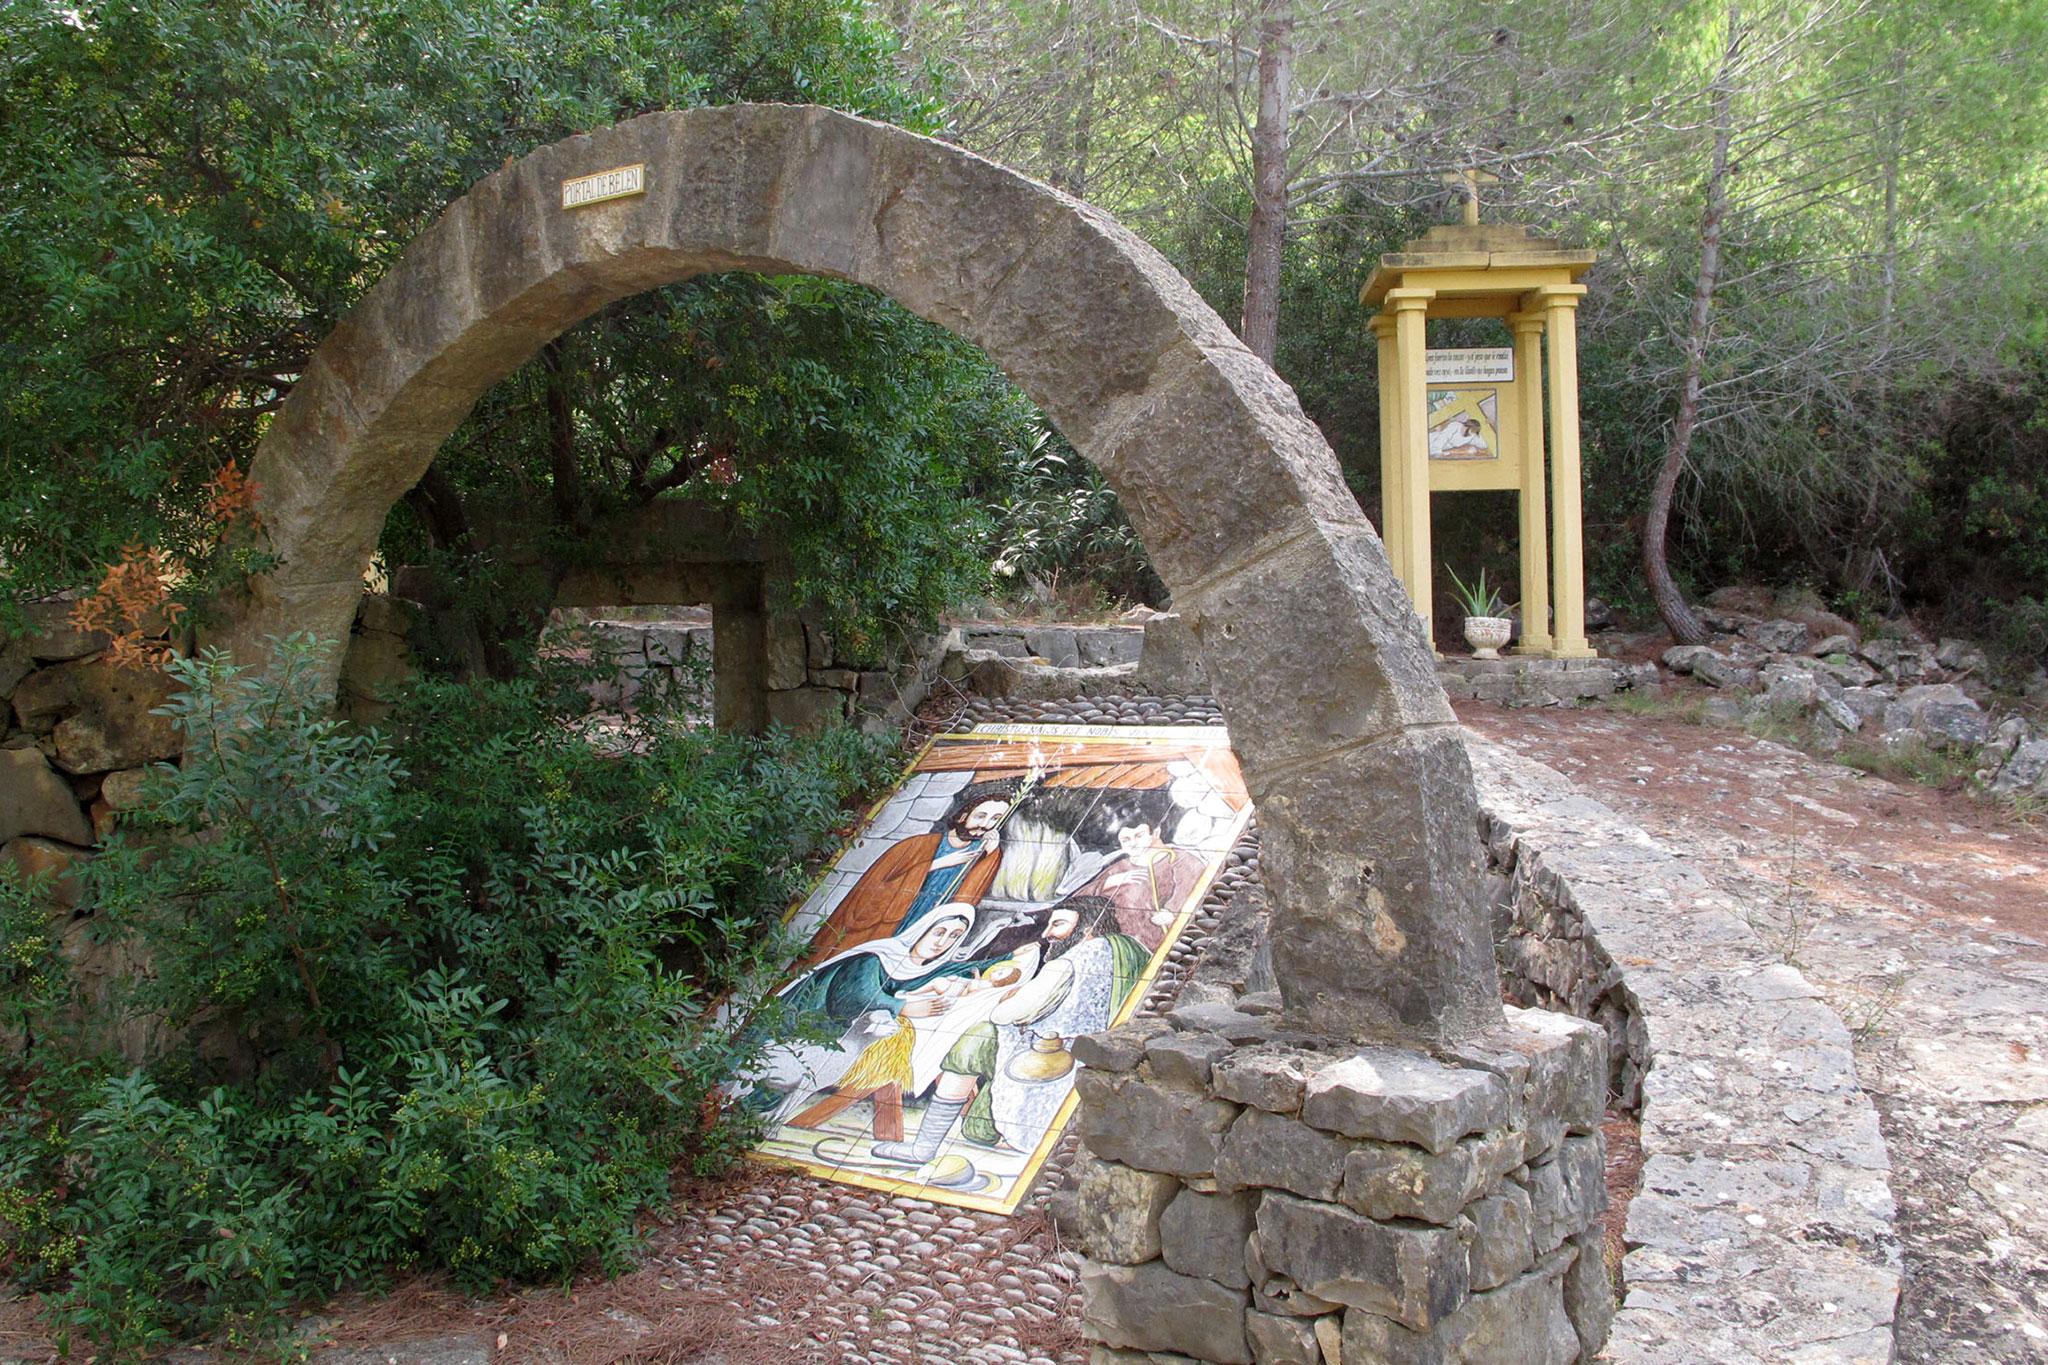 Detalle del Via Crucis de la Ermita del Pare Pere